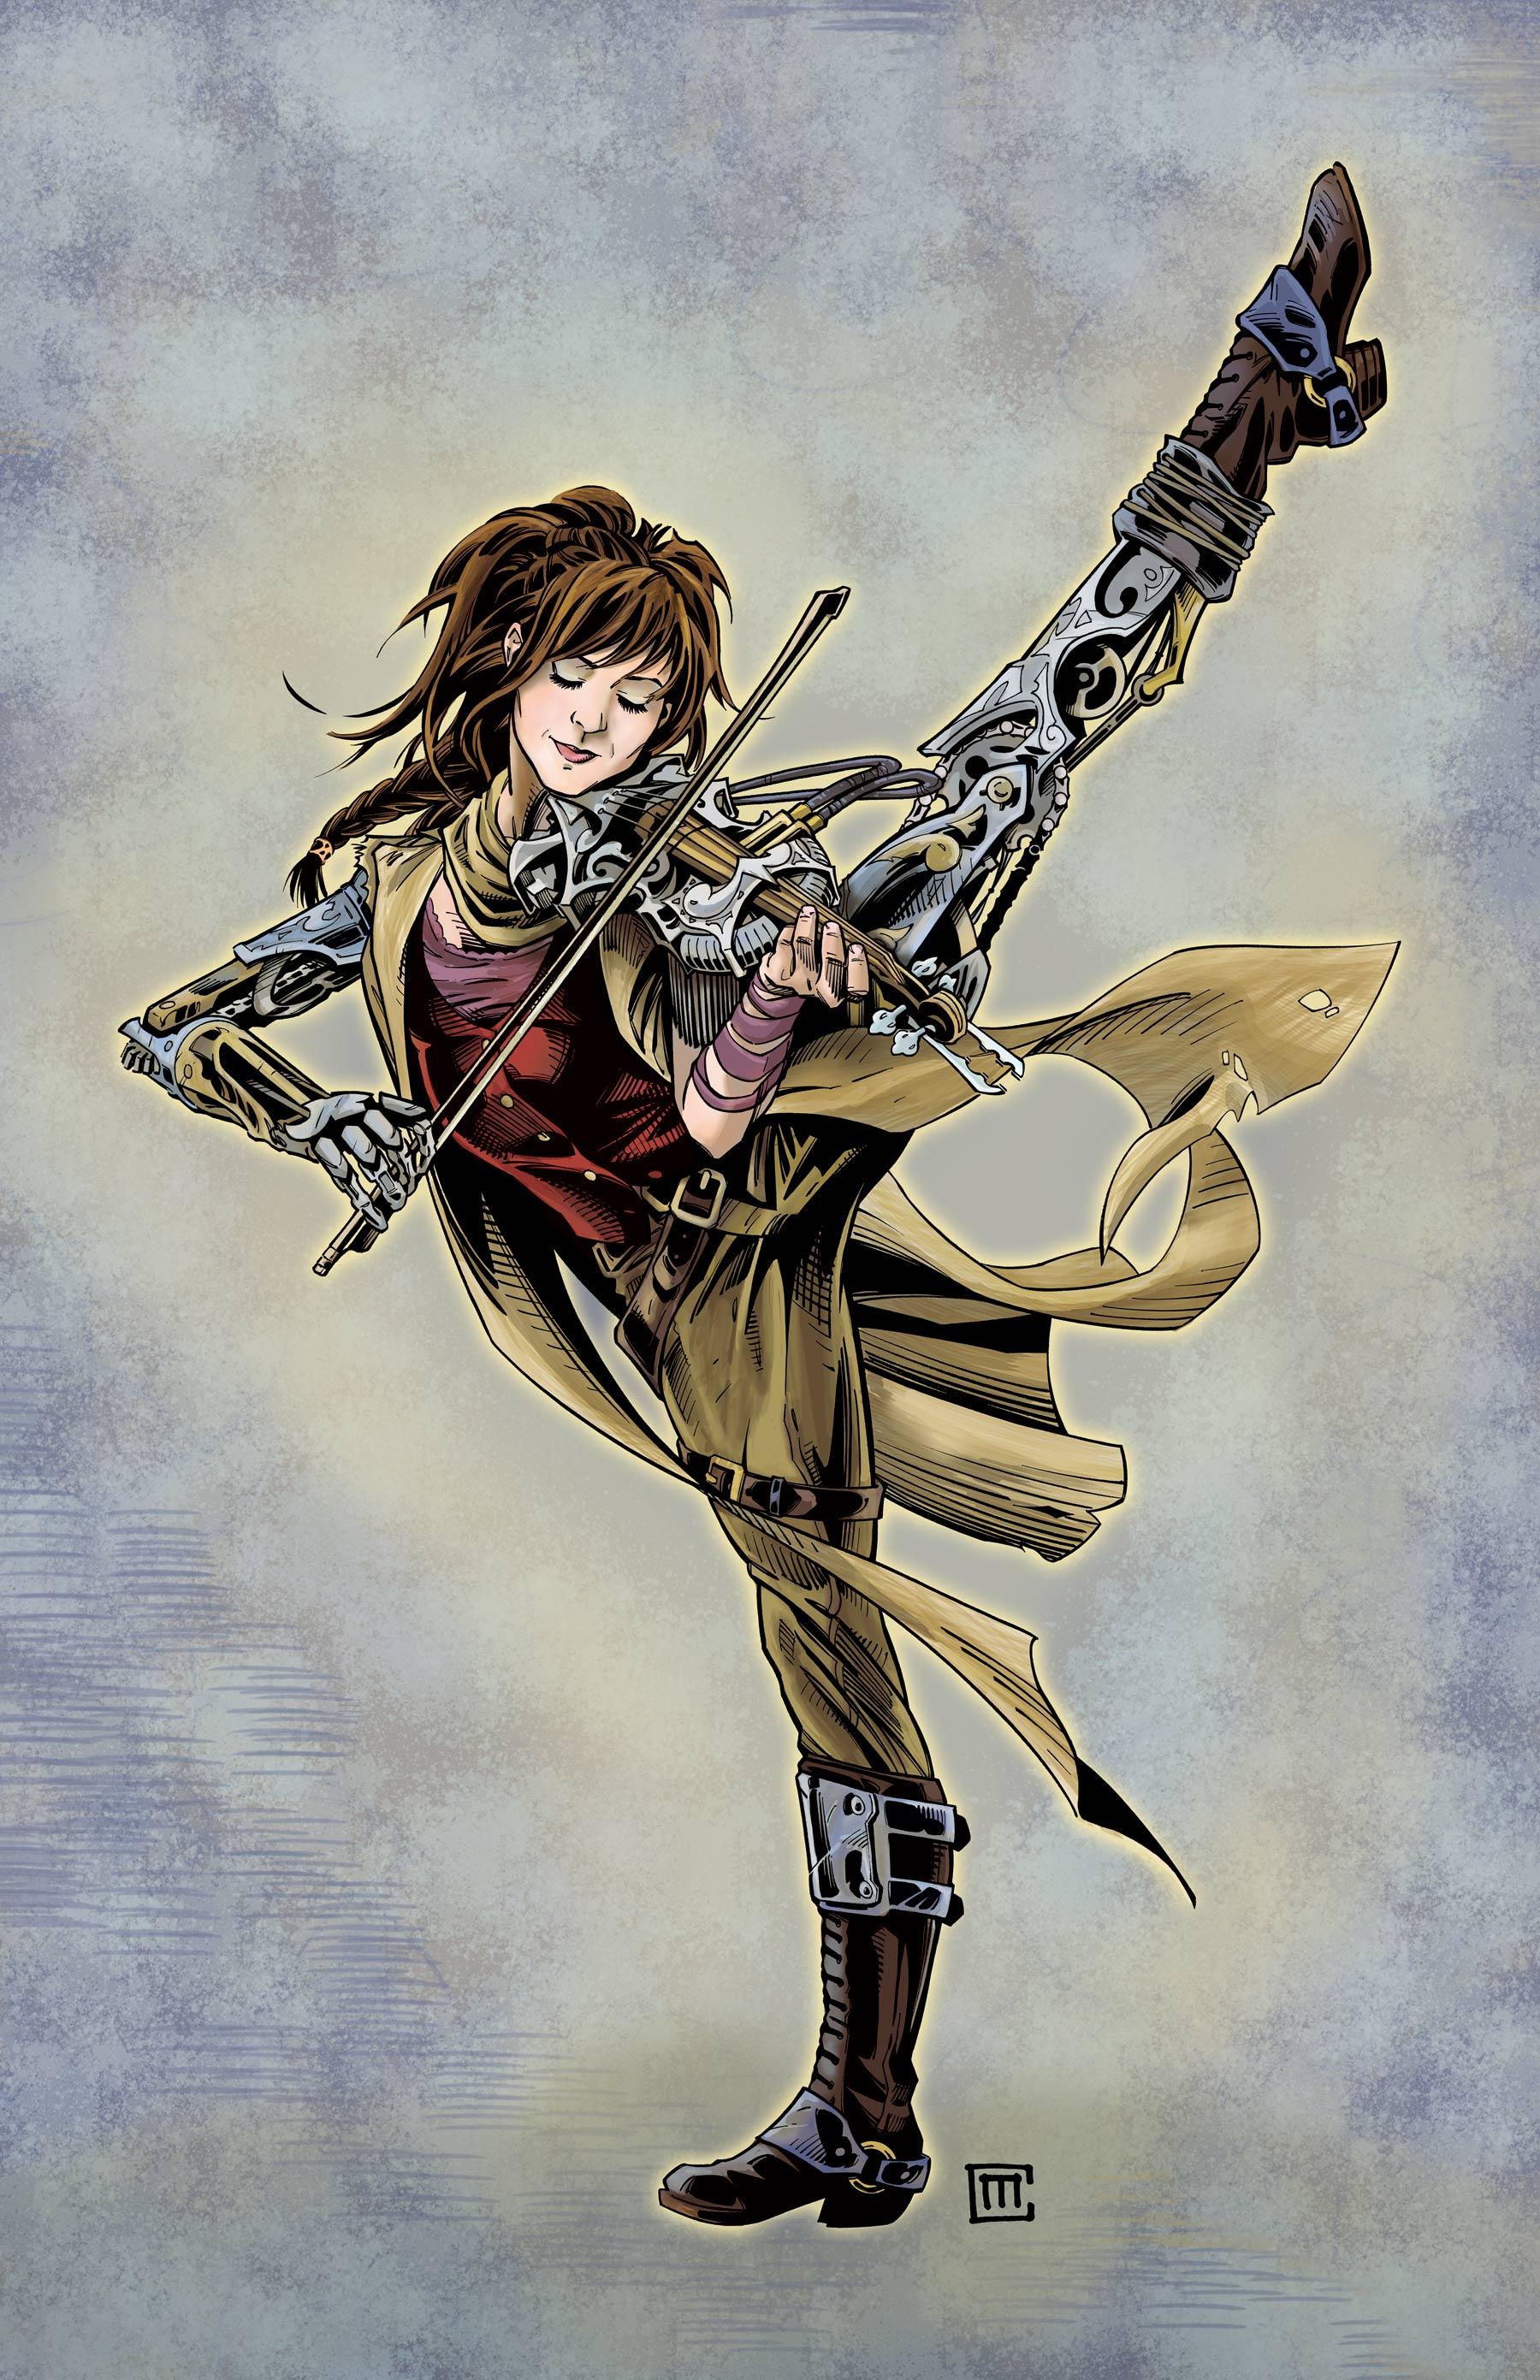 Lindsey-Stirling-Steampunk_colorFINAL_WEB.jpg